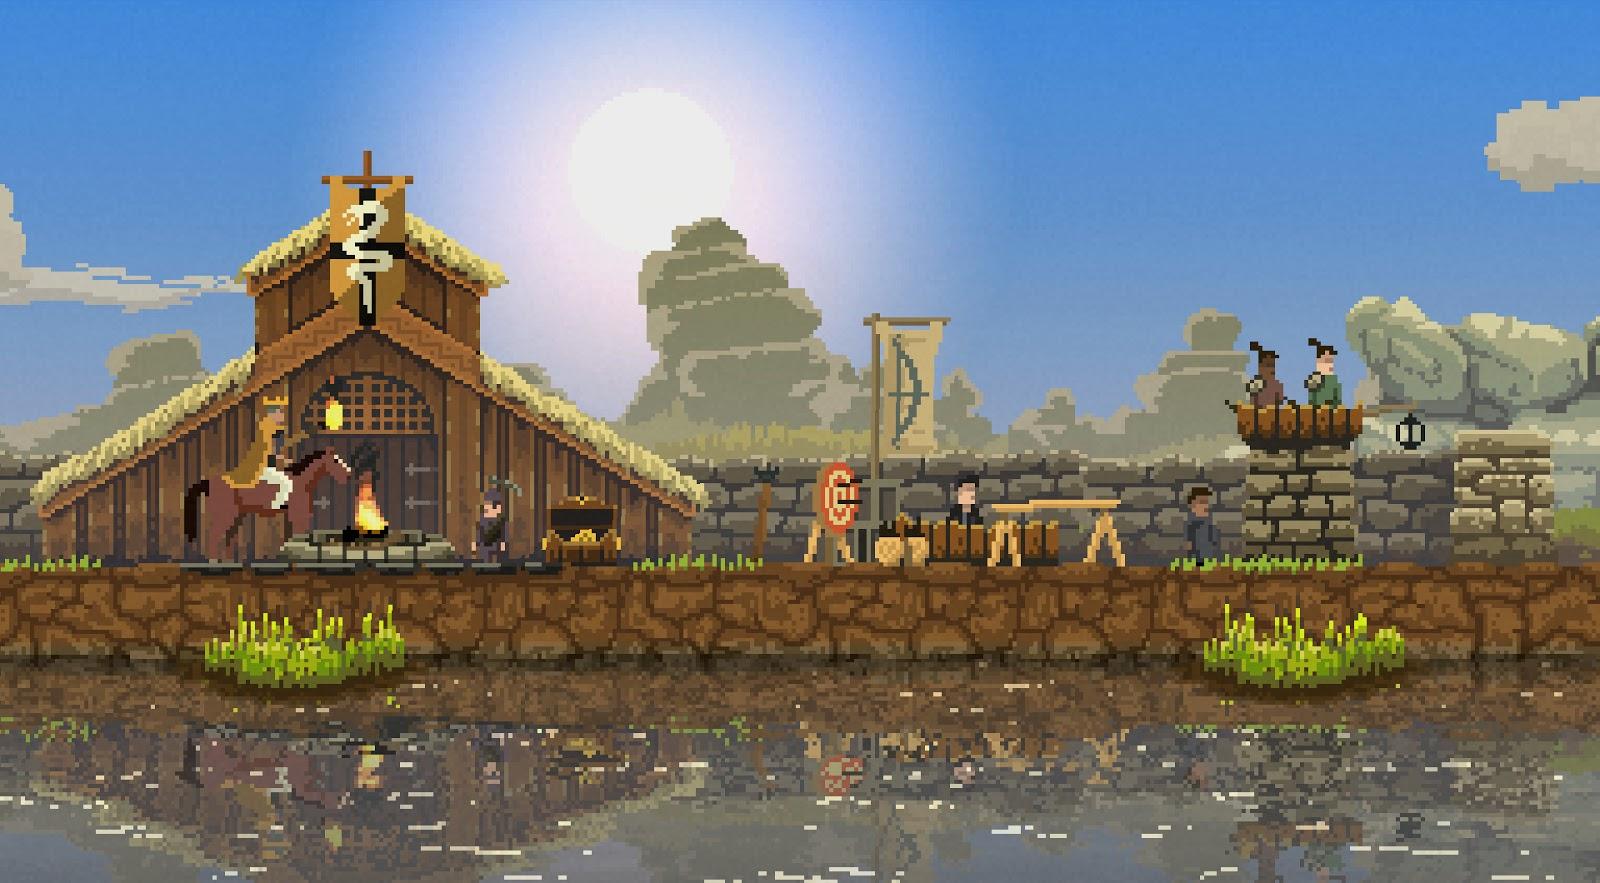 Kingdom Building Games Pc Like Clash Of Clans